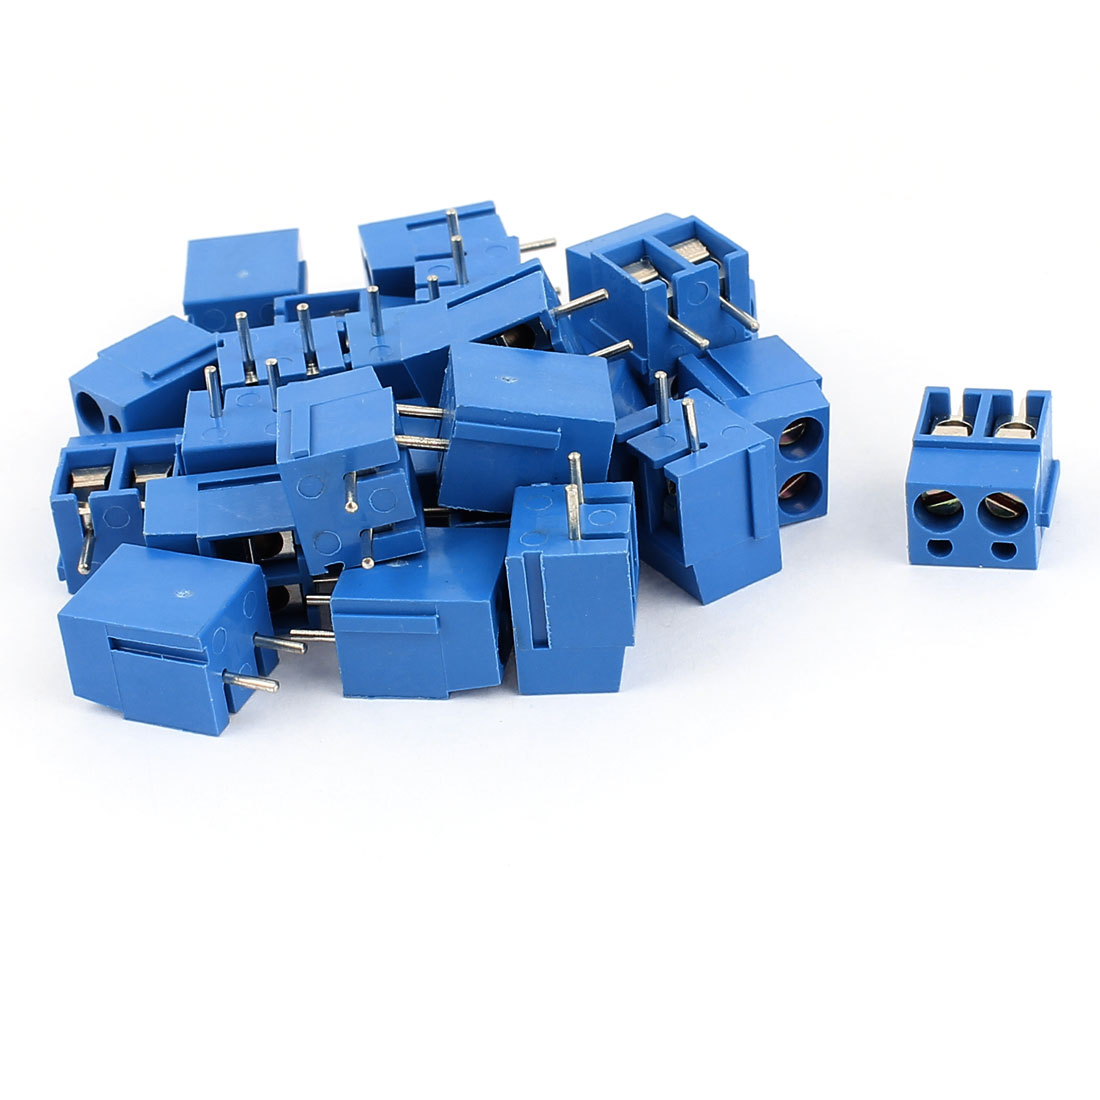 25 Pcs KF300 16A 300V 2 Terminals 5mm Pitch AWG14-22 PCB Mount Terminal Block Blue